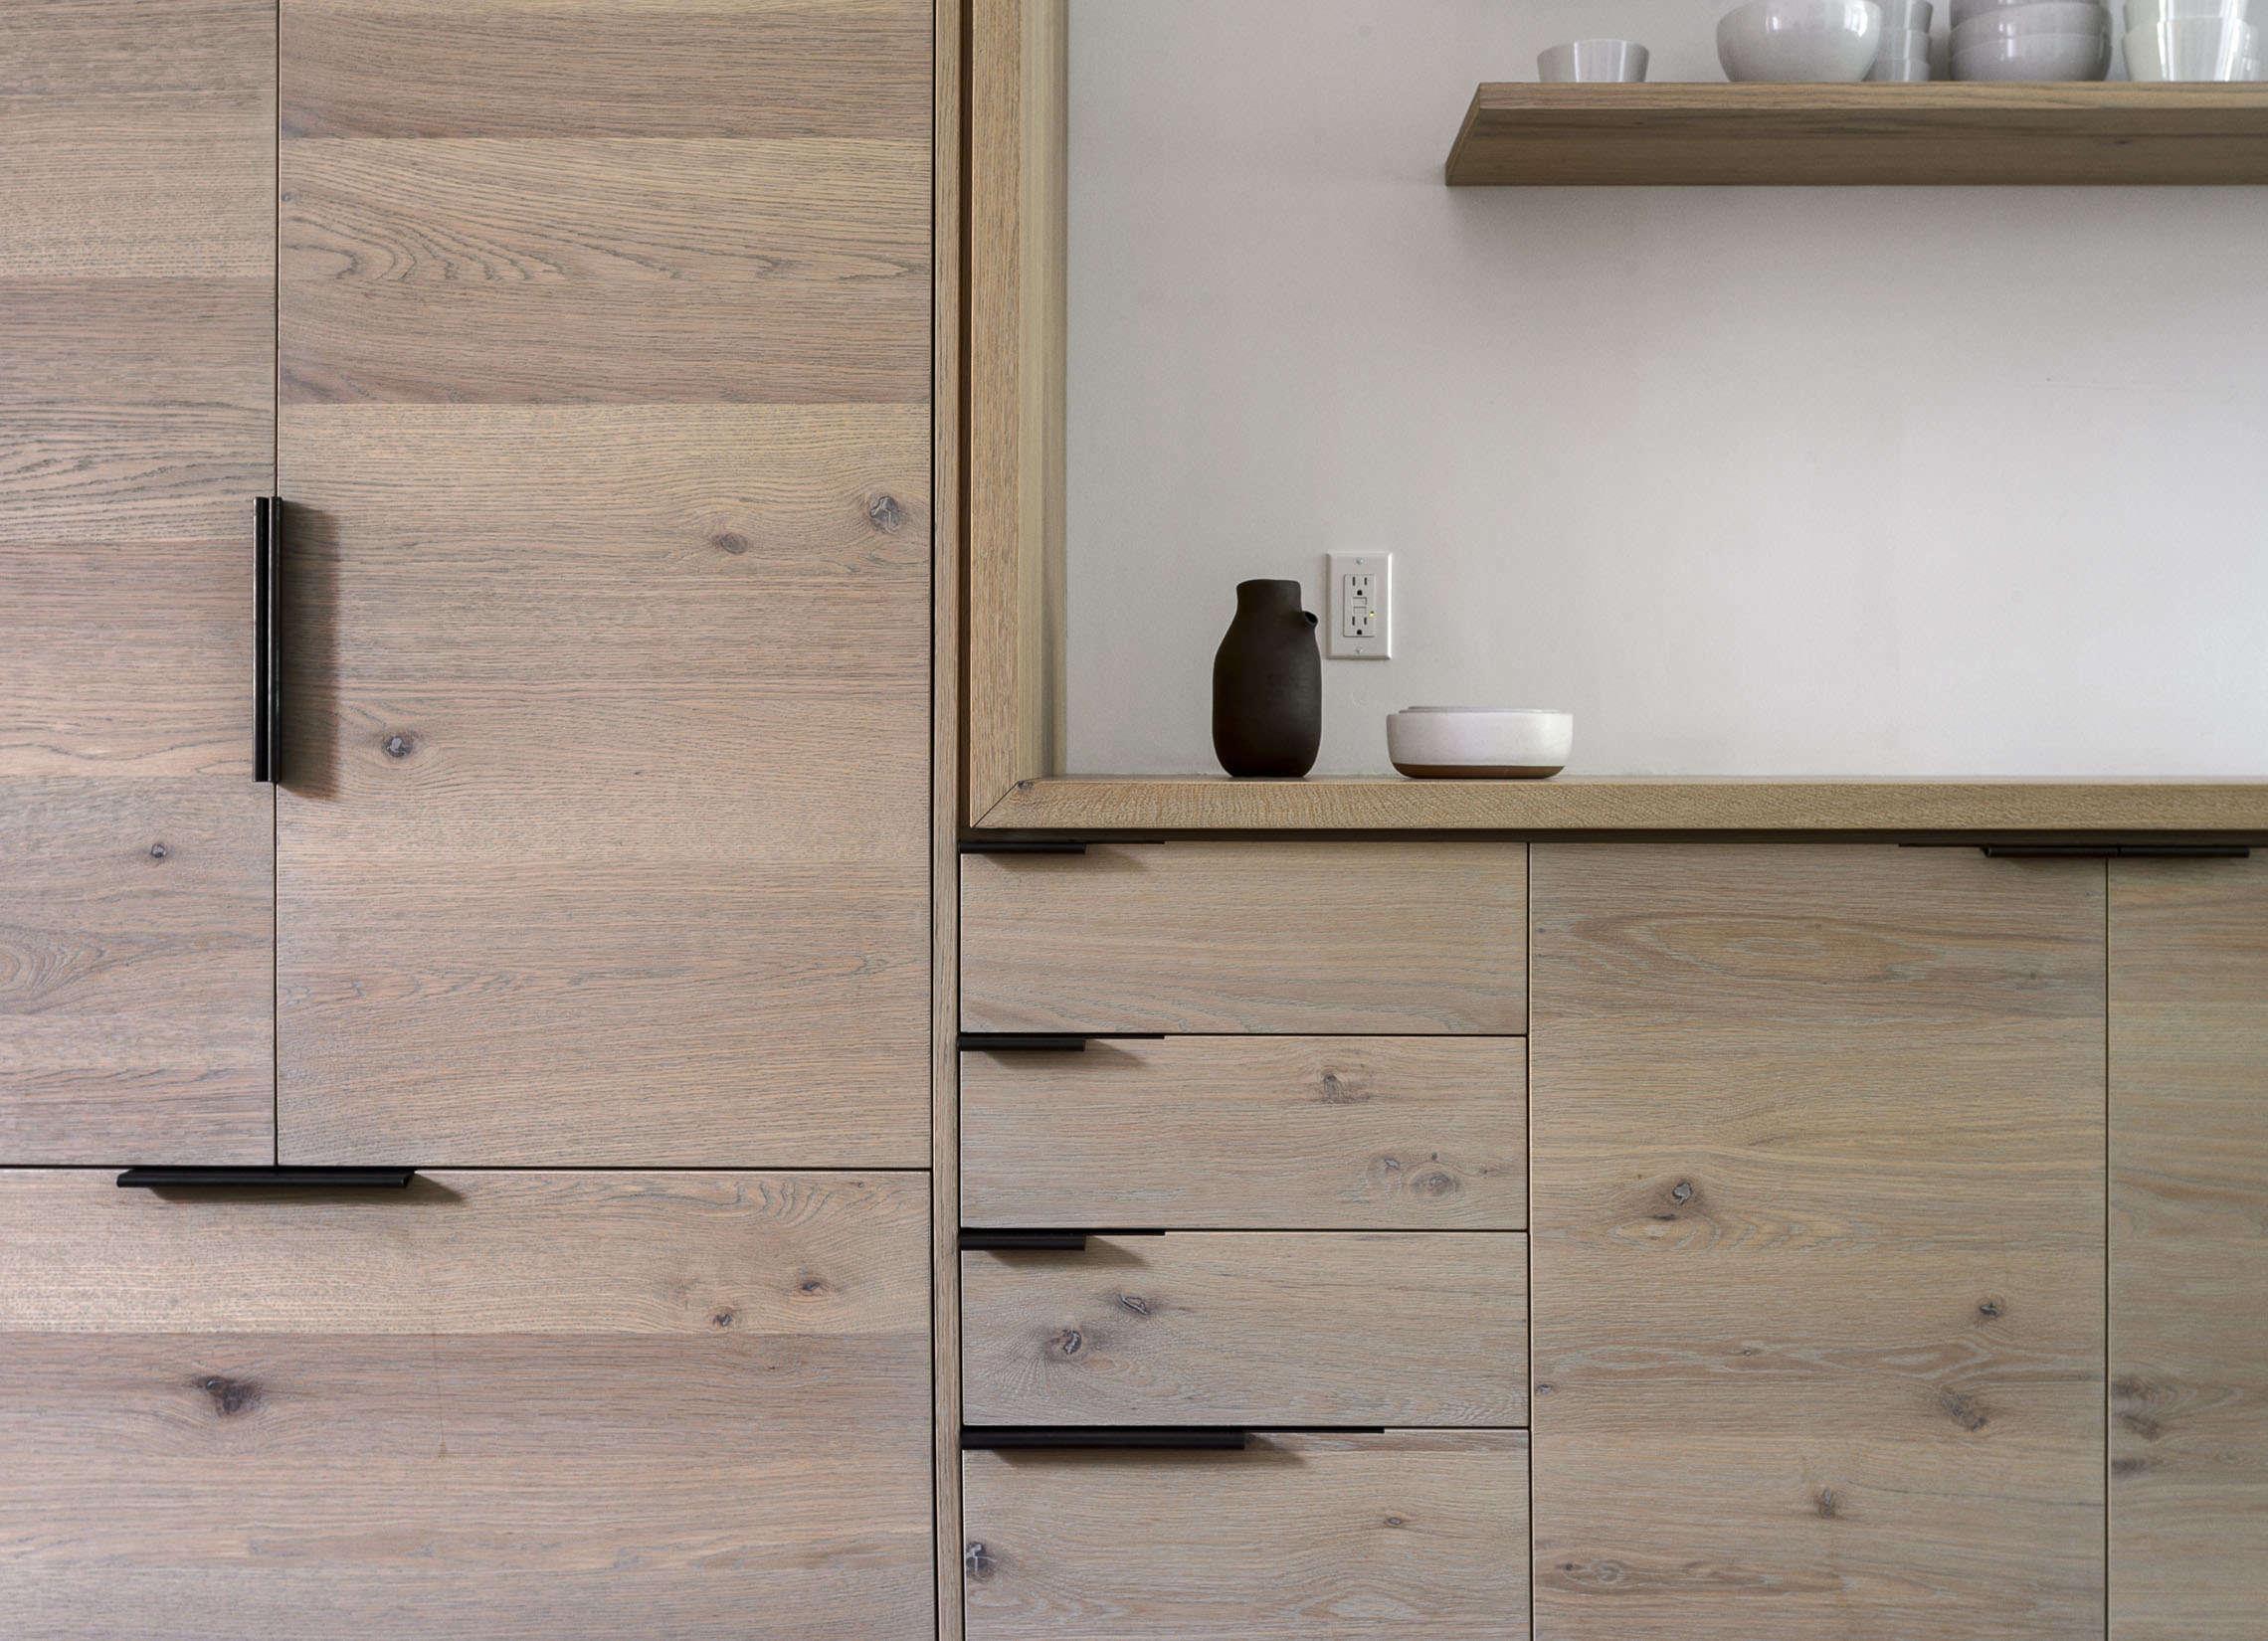 brooklyn kitchen remodel with custom oak cabinets, design by workstead, matthew 13